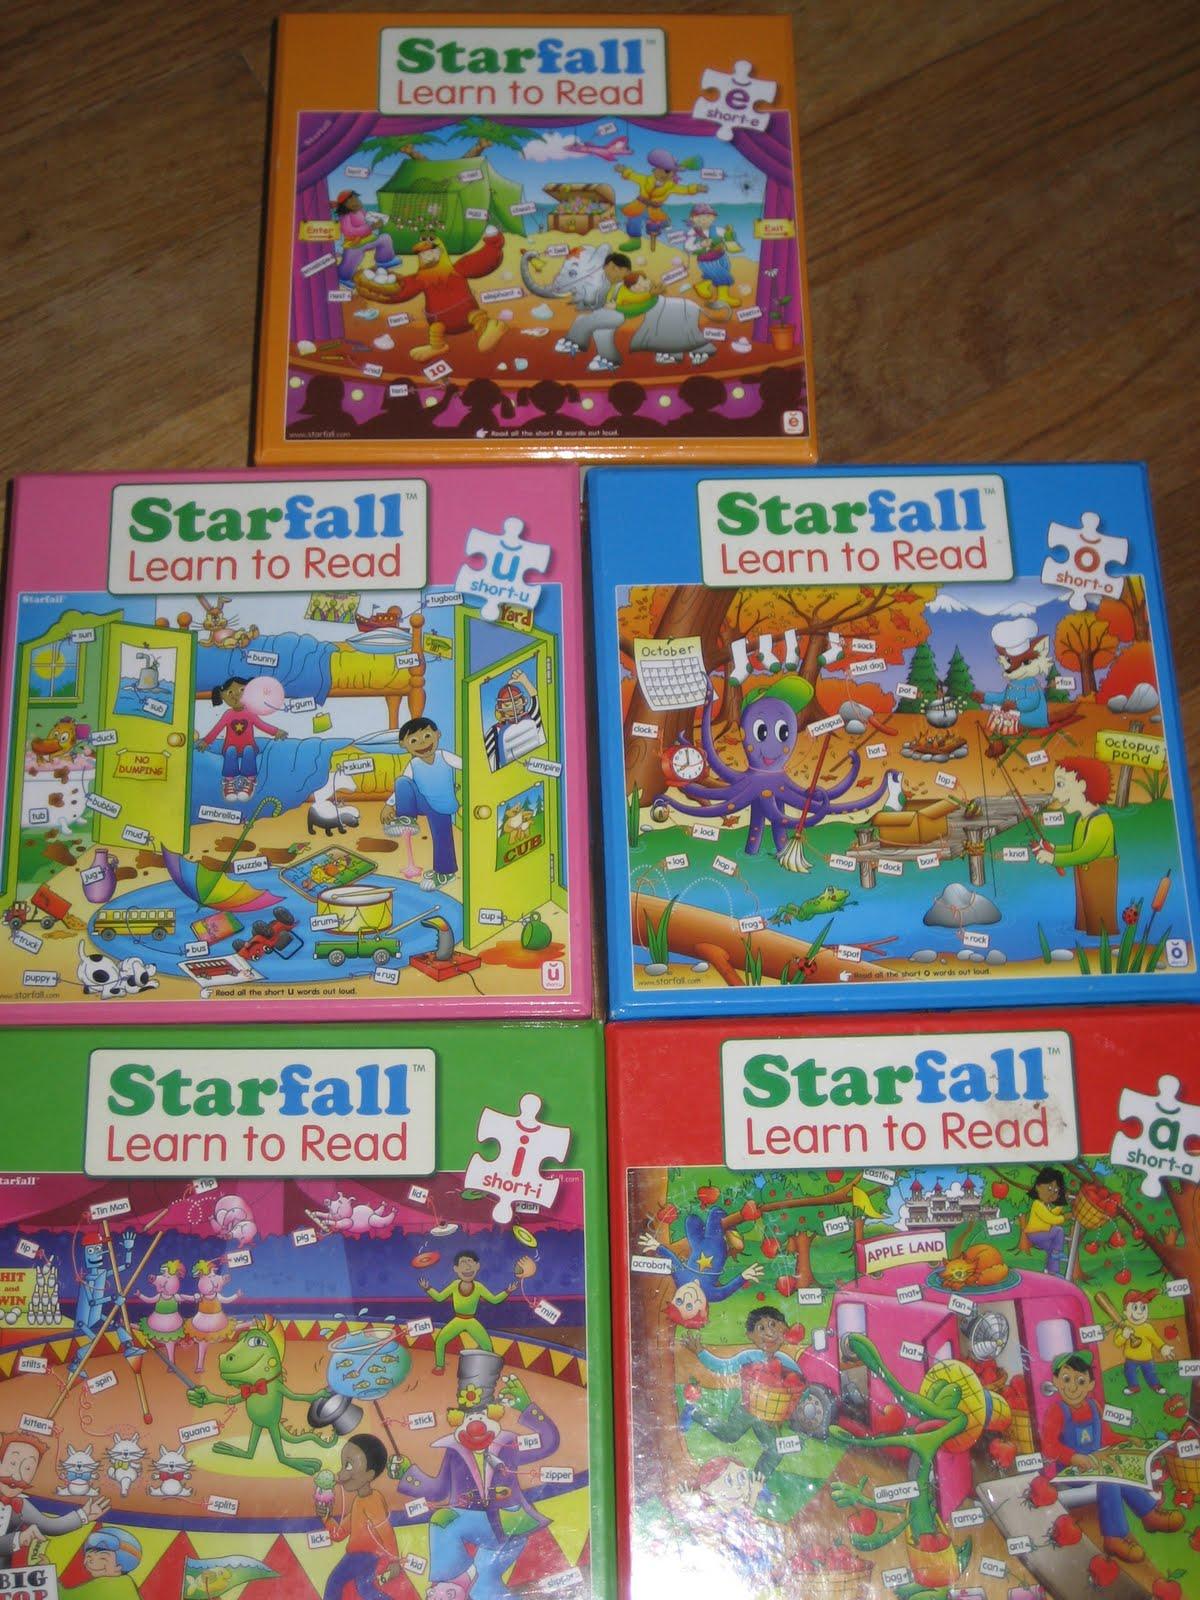 Star Full Colorful Deck Major Arcana Stock Illustration: The Preschool Experiment: Garage Sale Treasures: Week 17